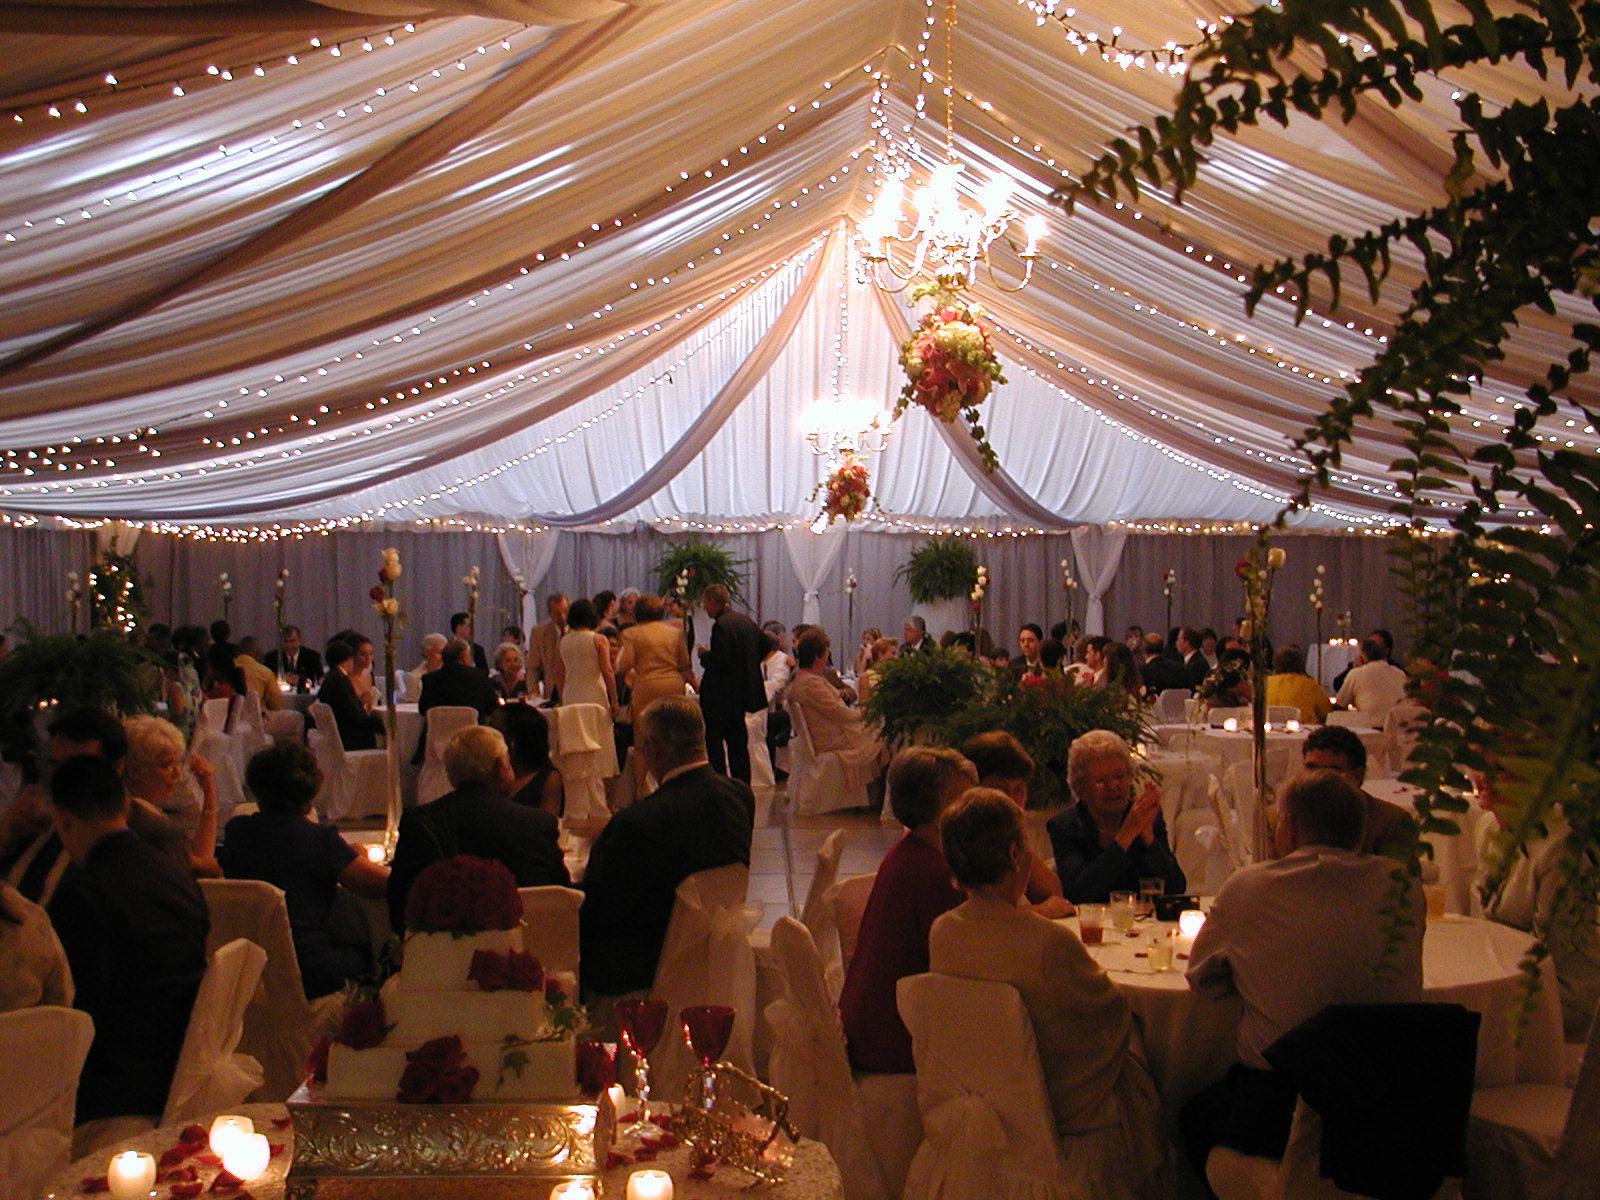 bourdeaux and silver wedding.JPG